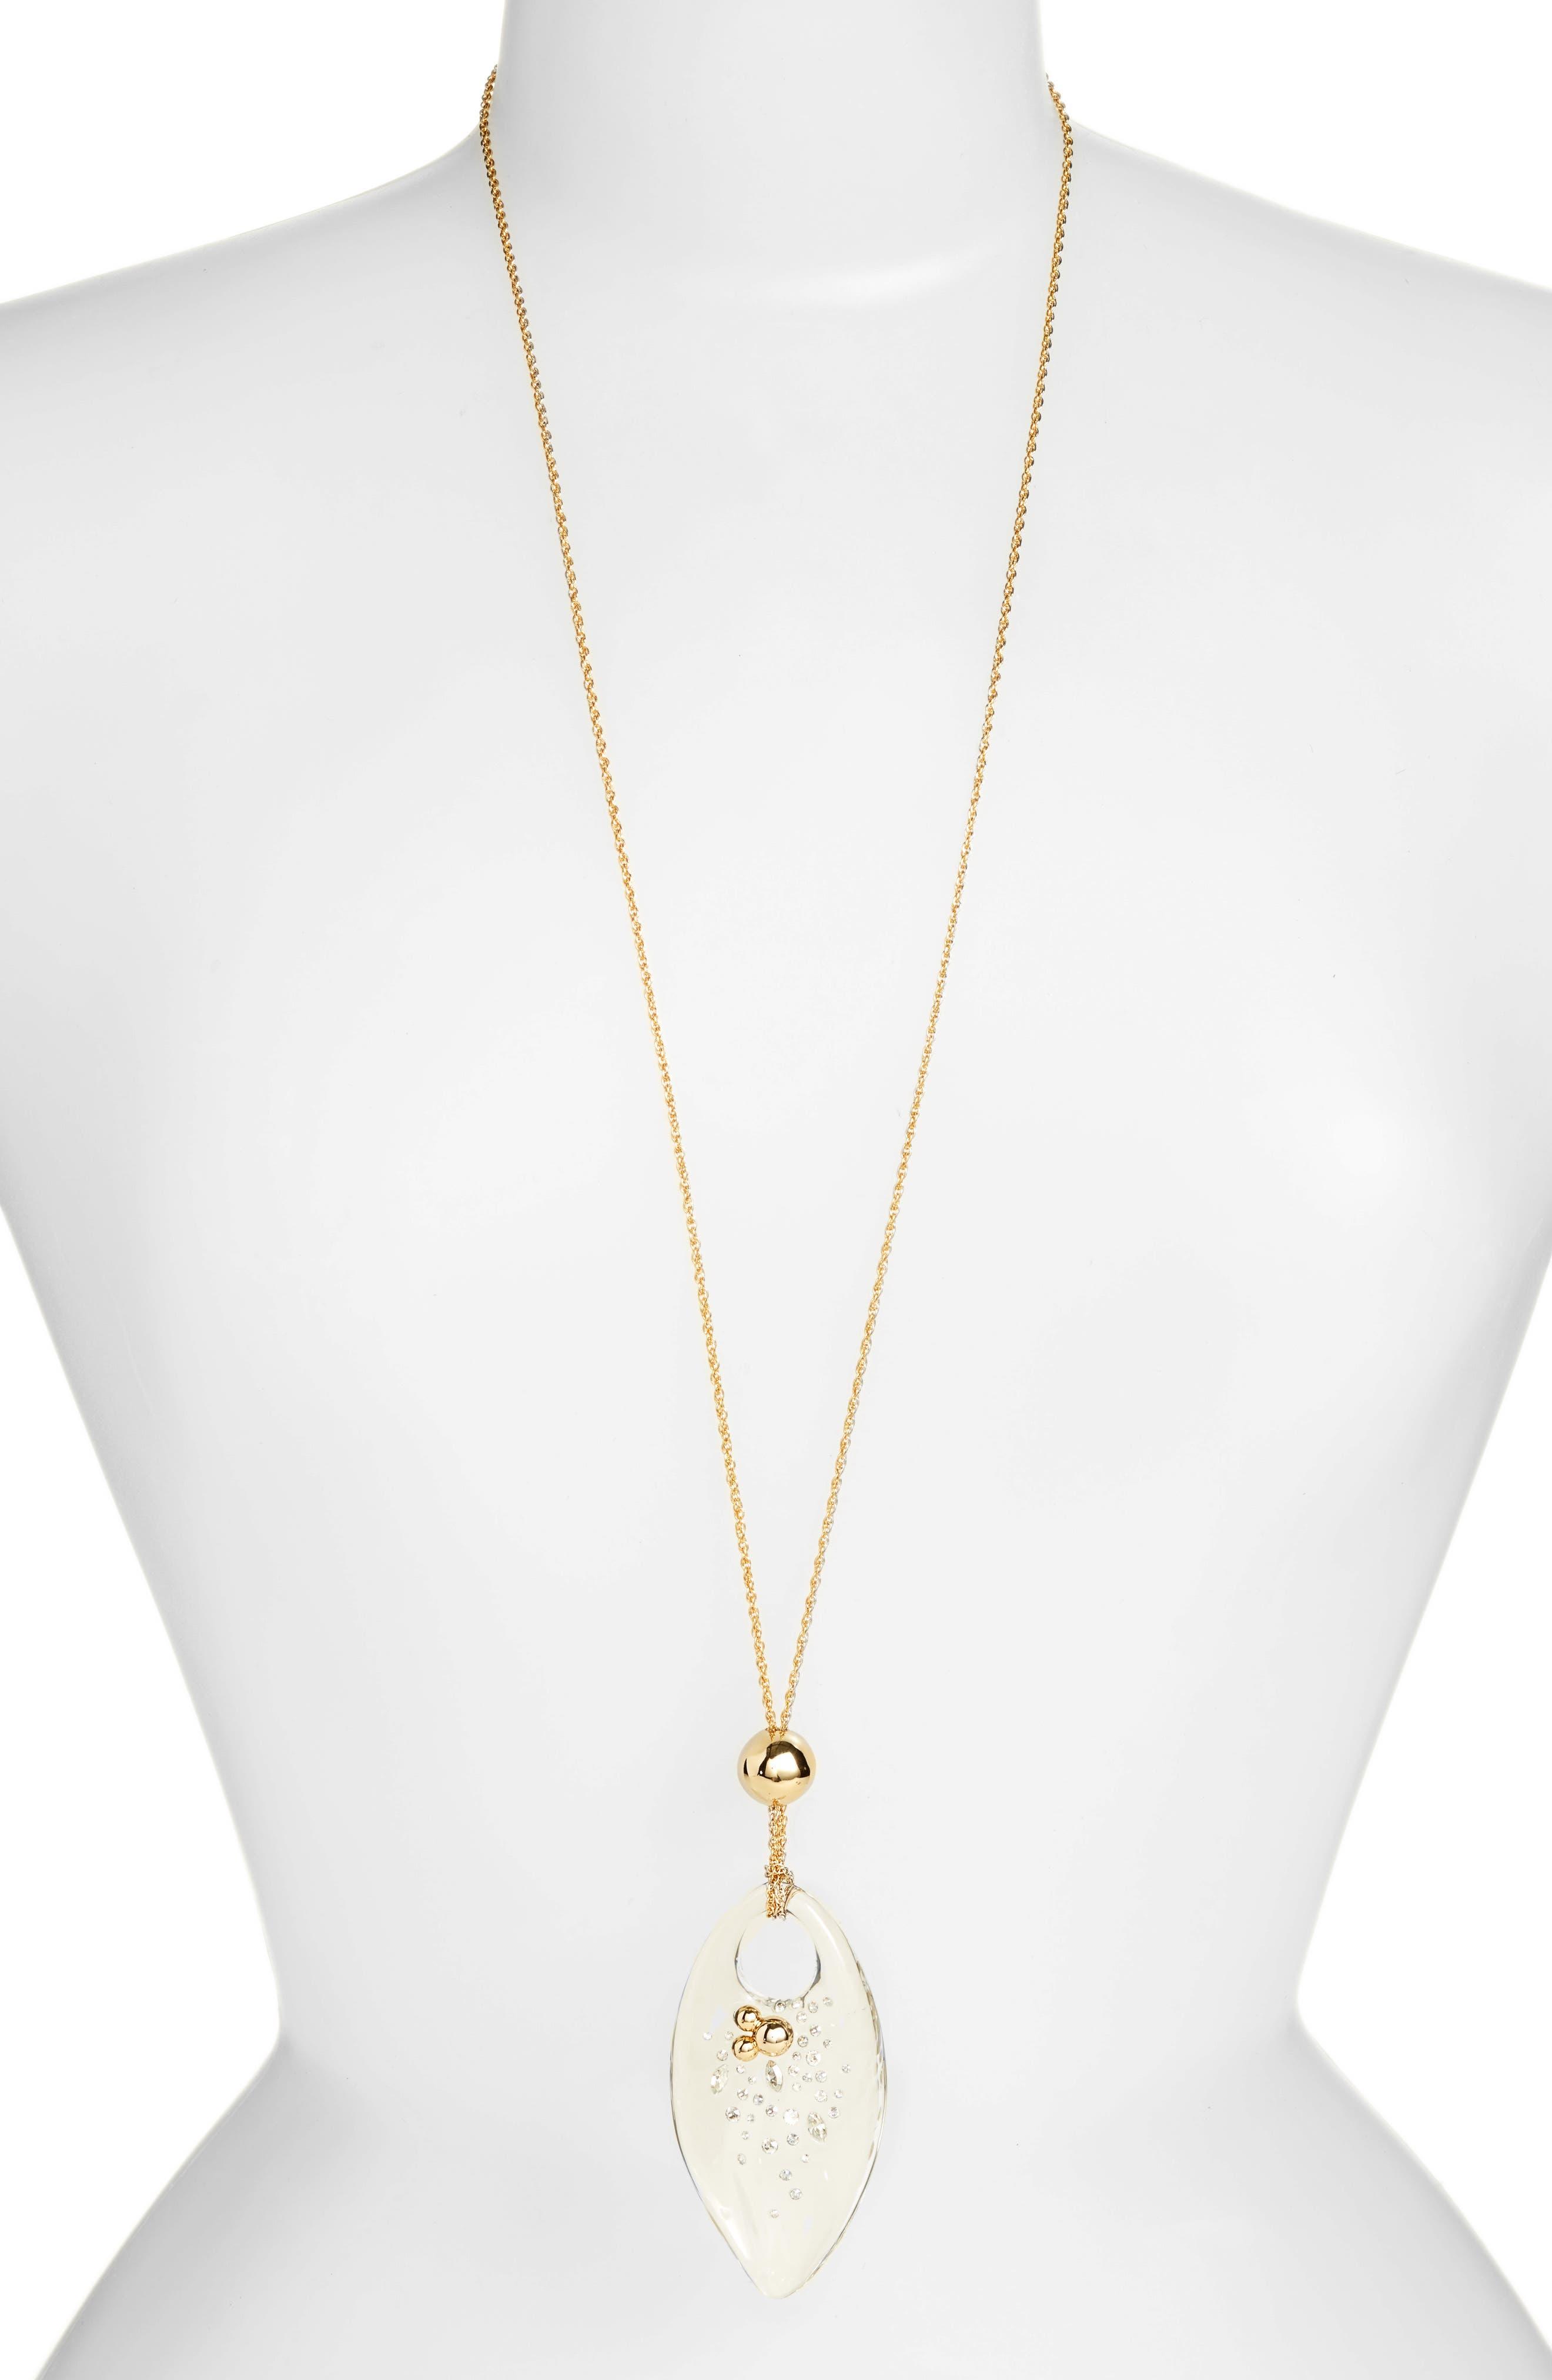 Alexis Bittar Lucite® Pendant Necklace